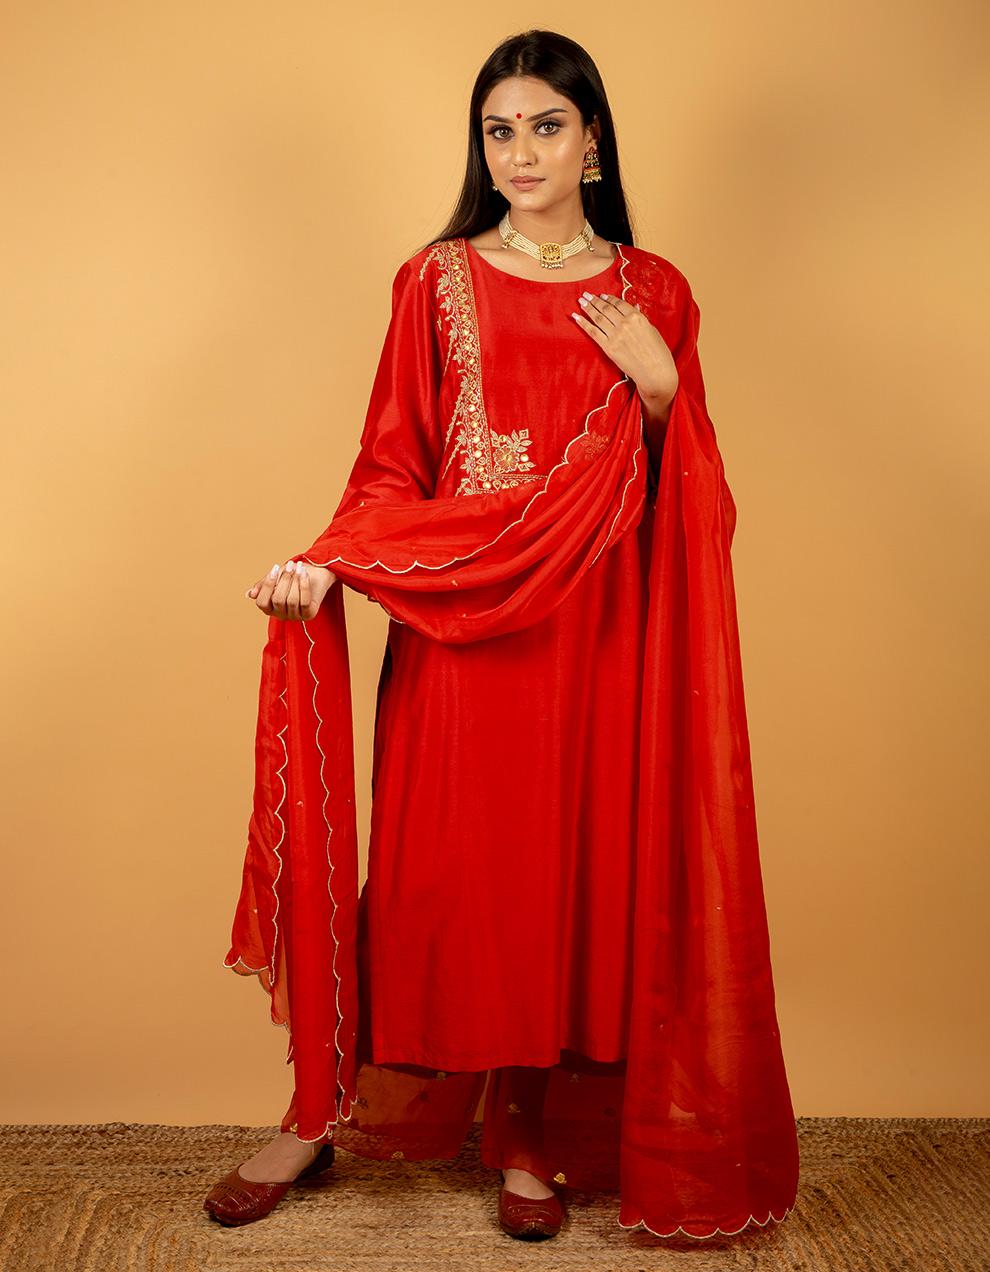 Velvet red dupatta designs for sale in India